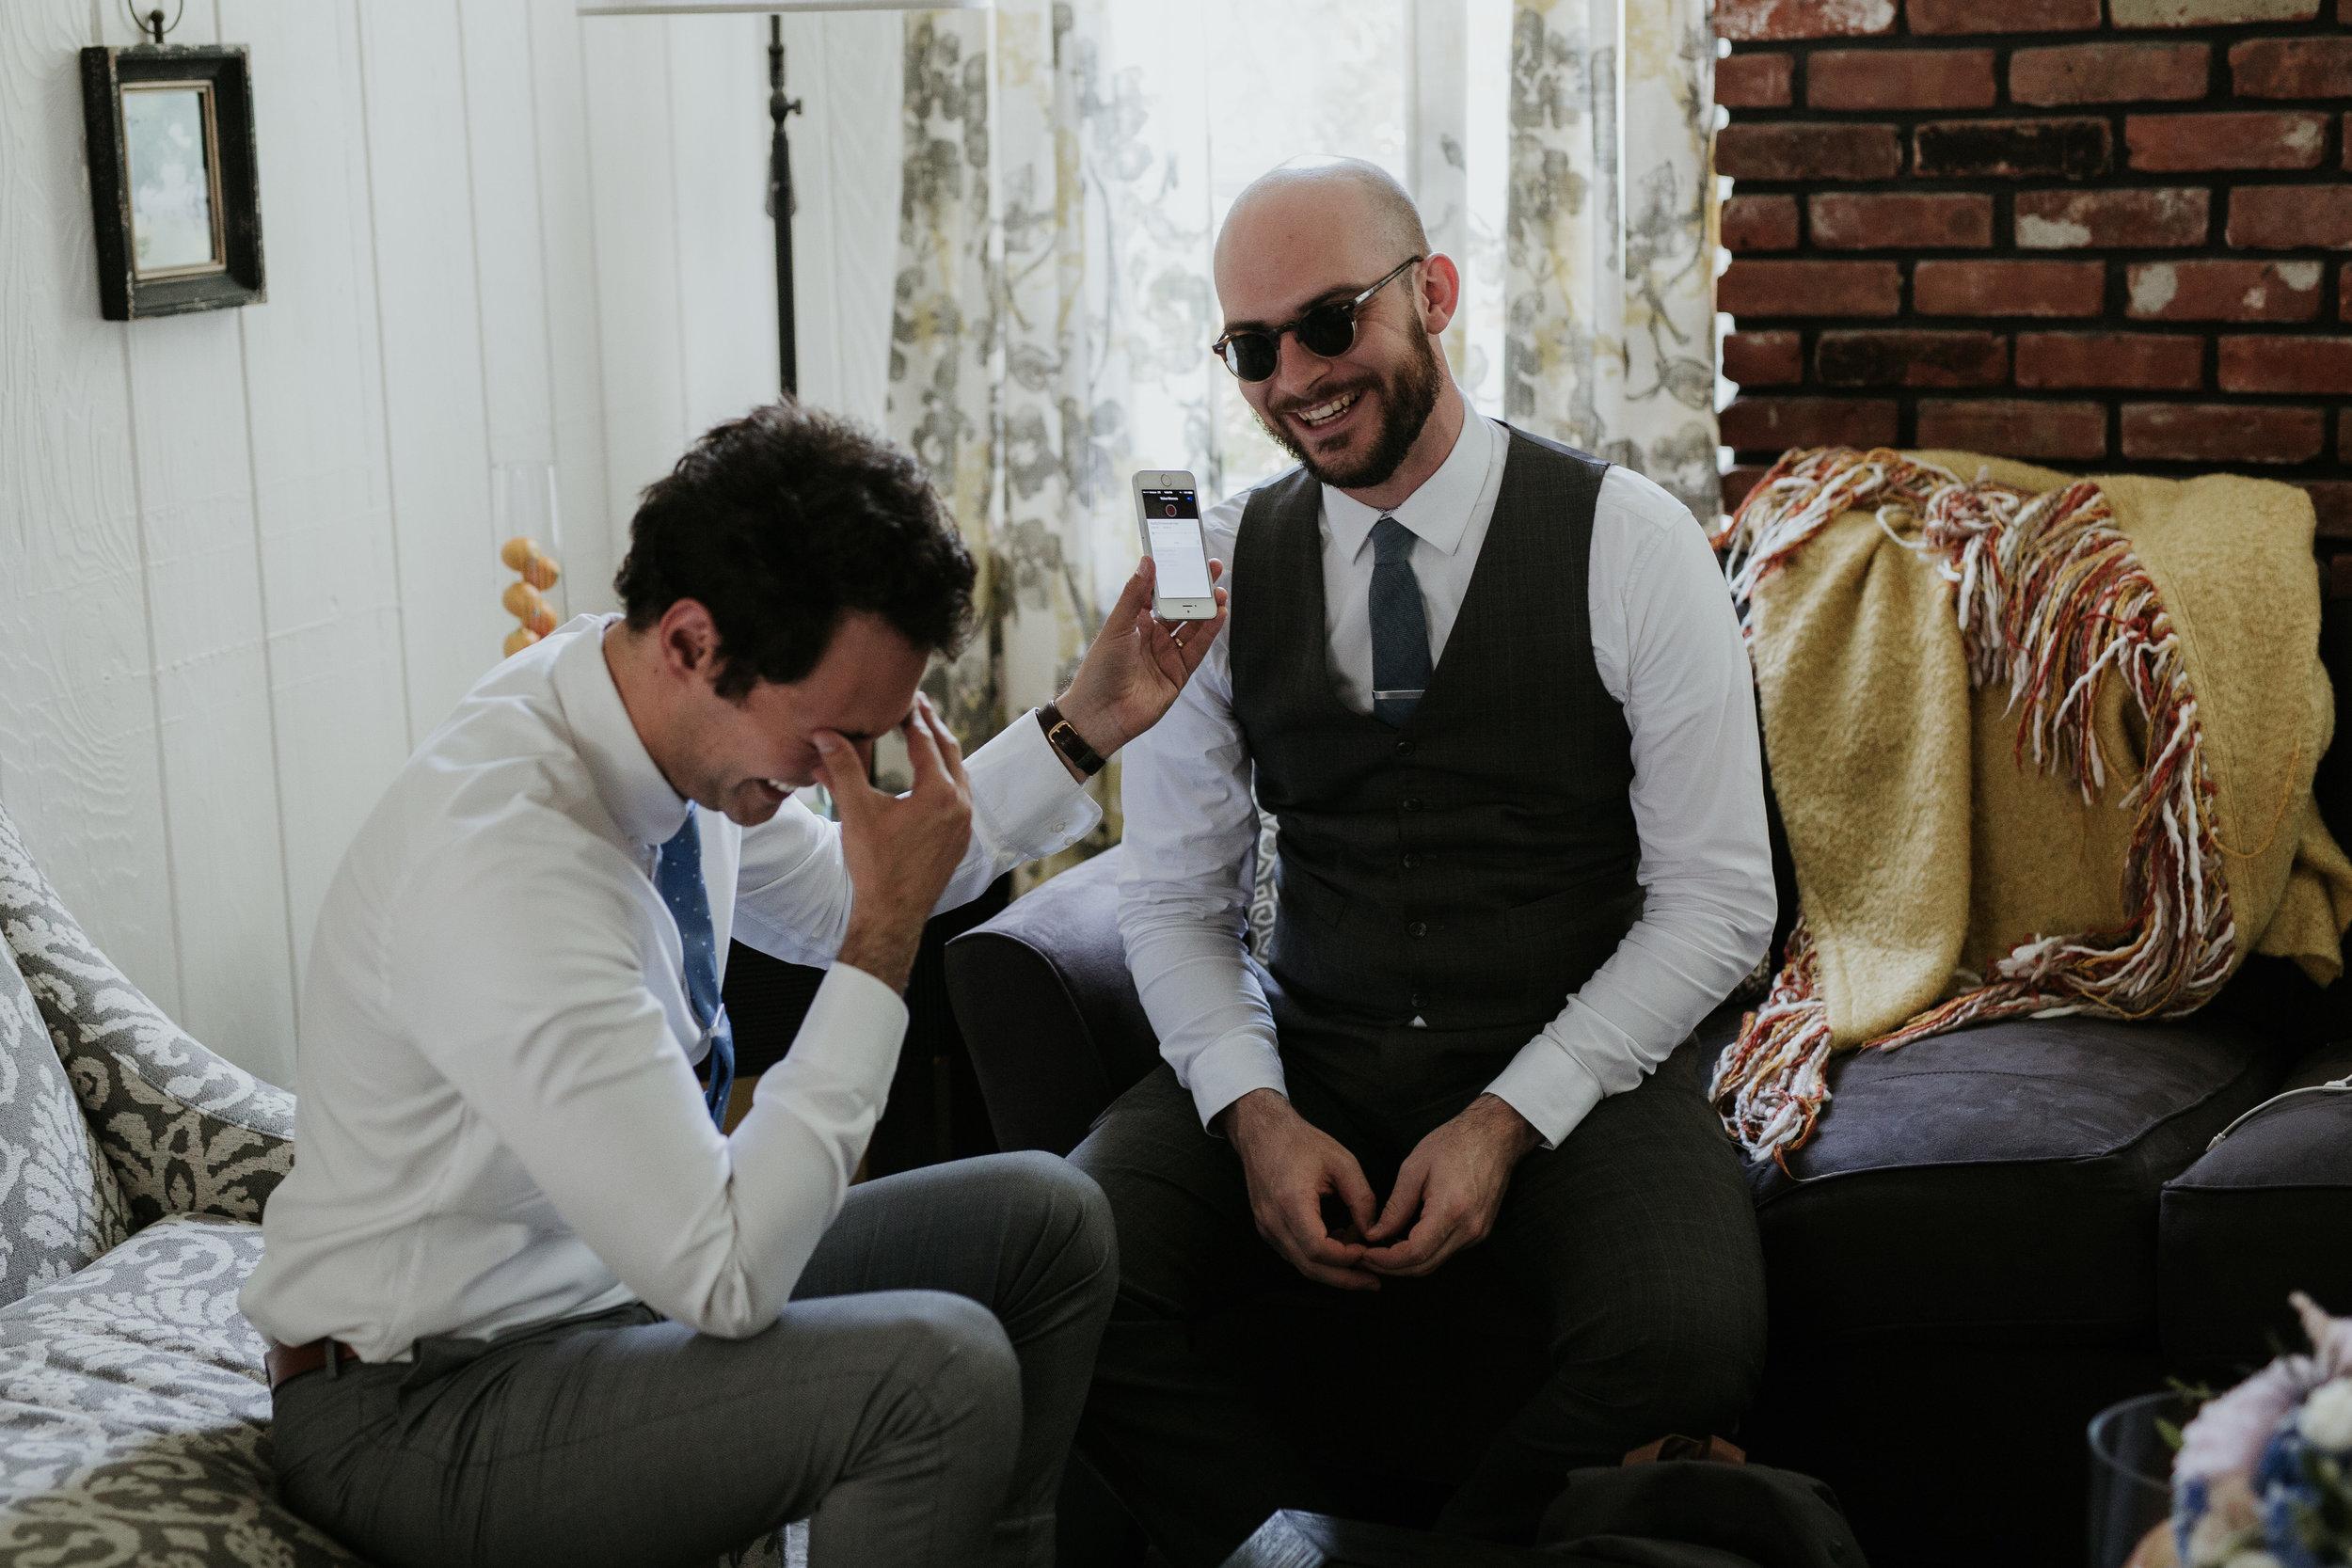 nostrano_vineyards_wedding_0007.JPG